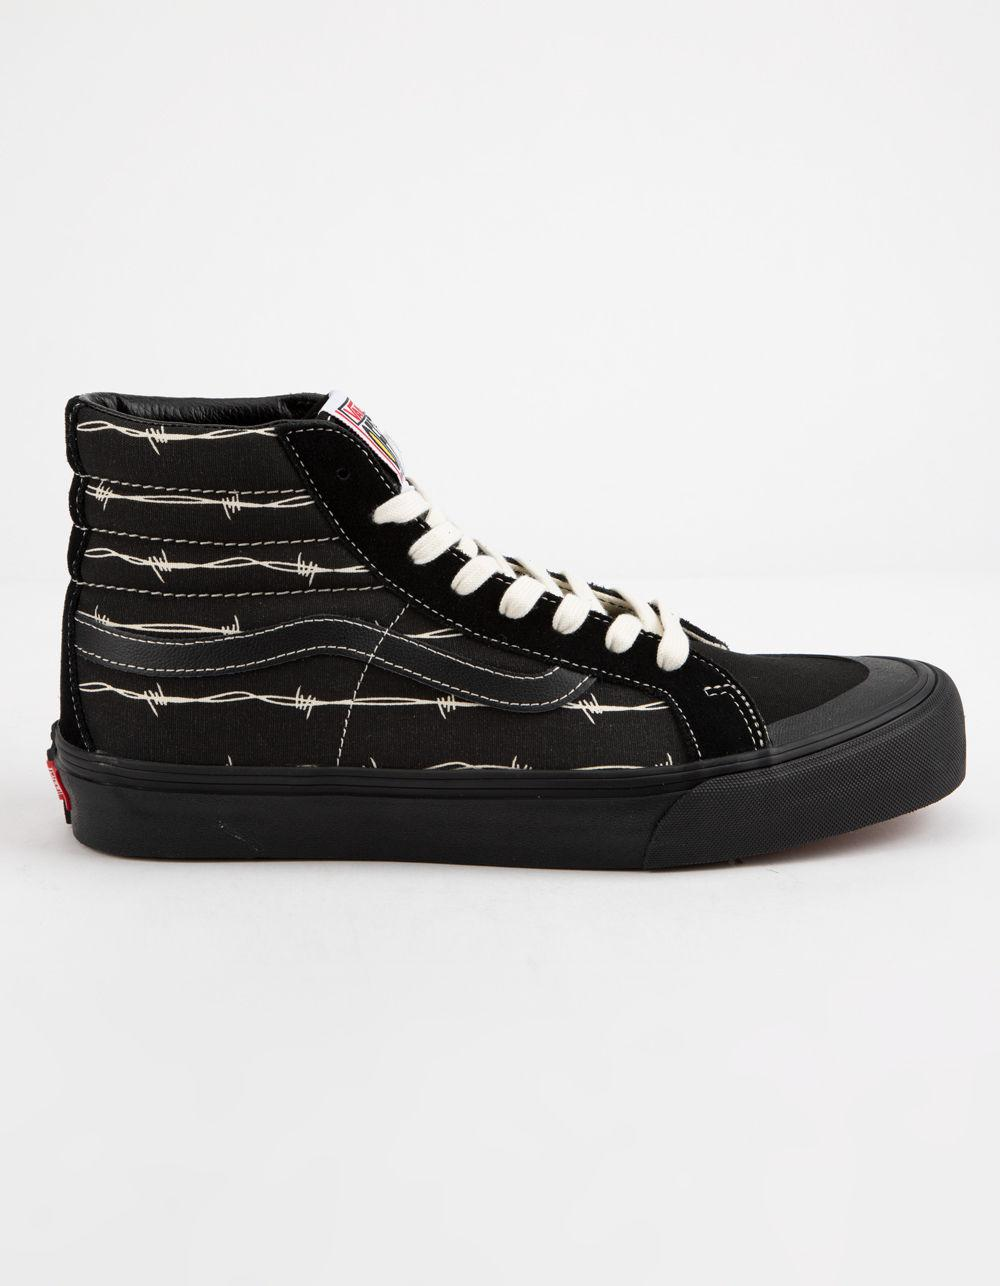 Lyst - Vans Sk8-hi 138 Sf Barbed Wire Sneaker in Black for Men ... 3e2a41967